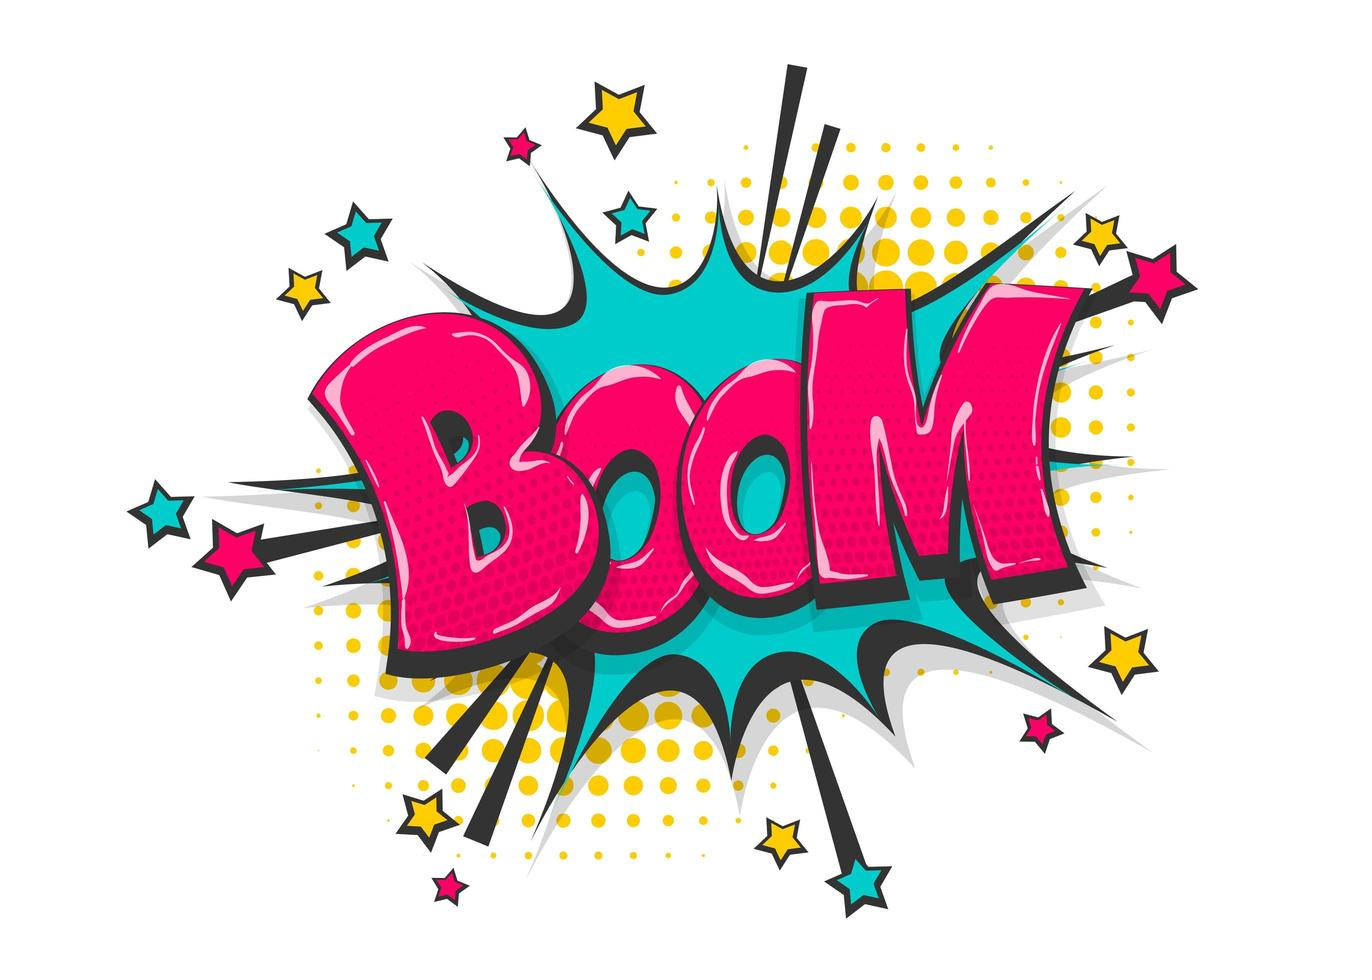 boom pop art diseño de texto de cómic vector